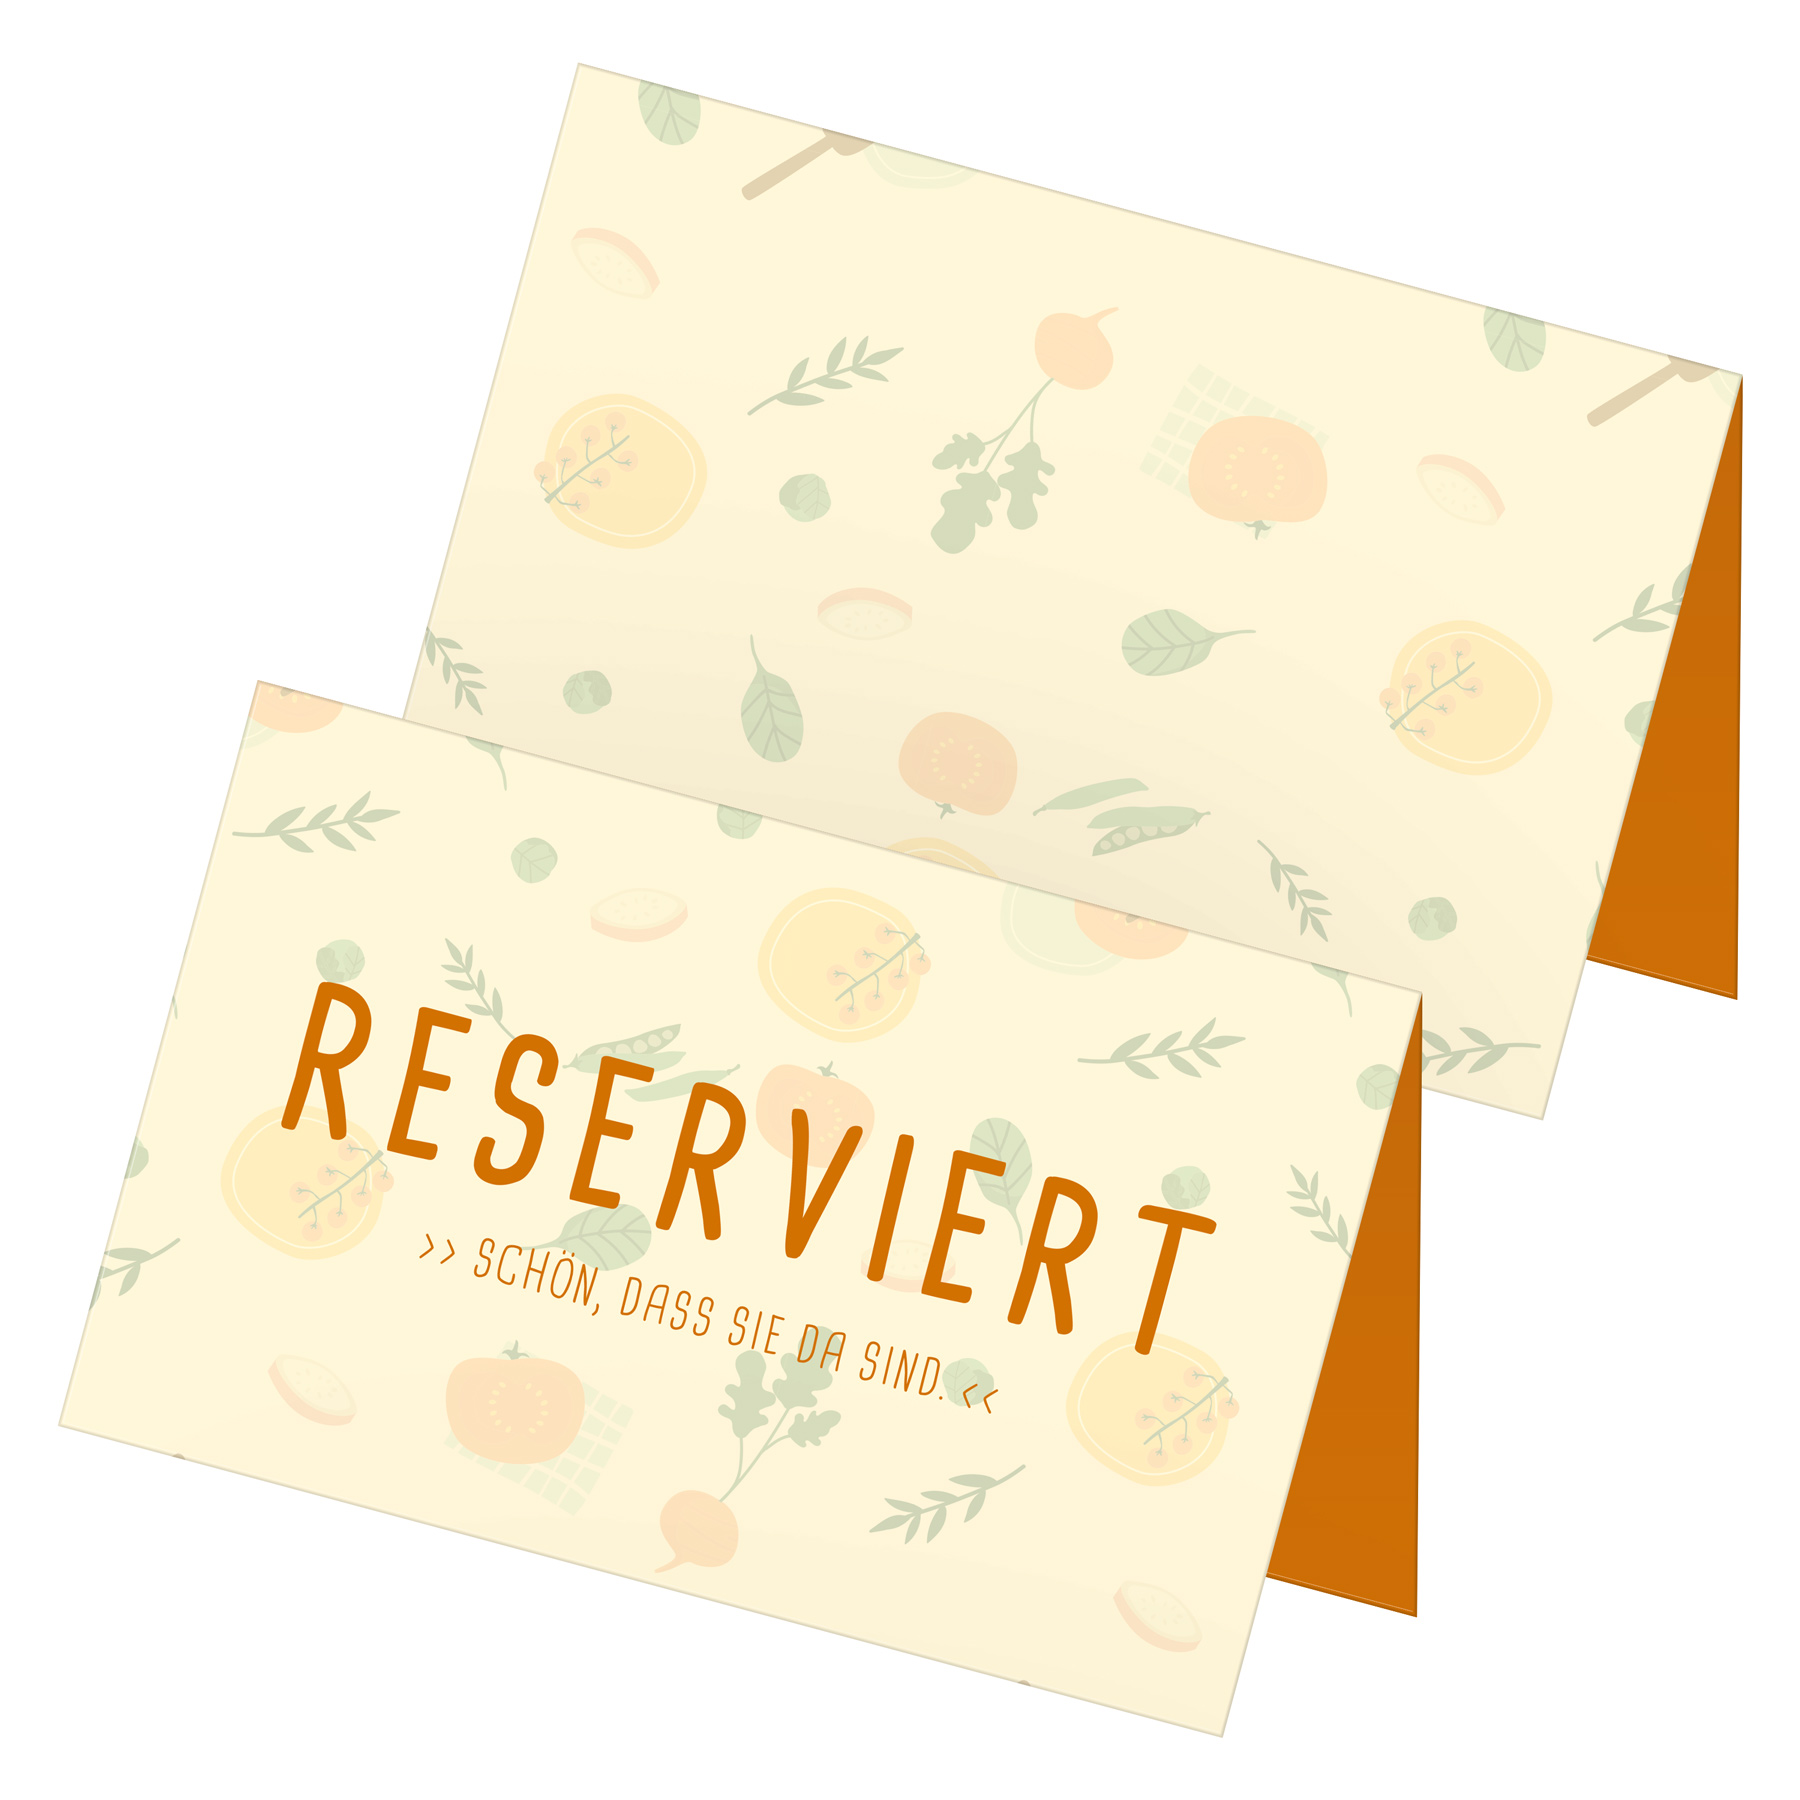 itenga 24x Tischkarten Reserviert Pastelltöne Veggie V...